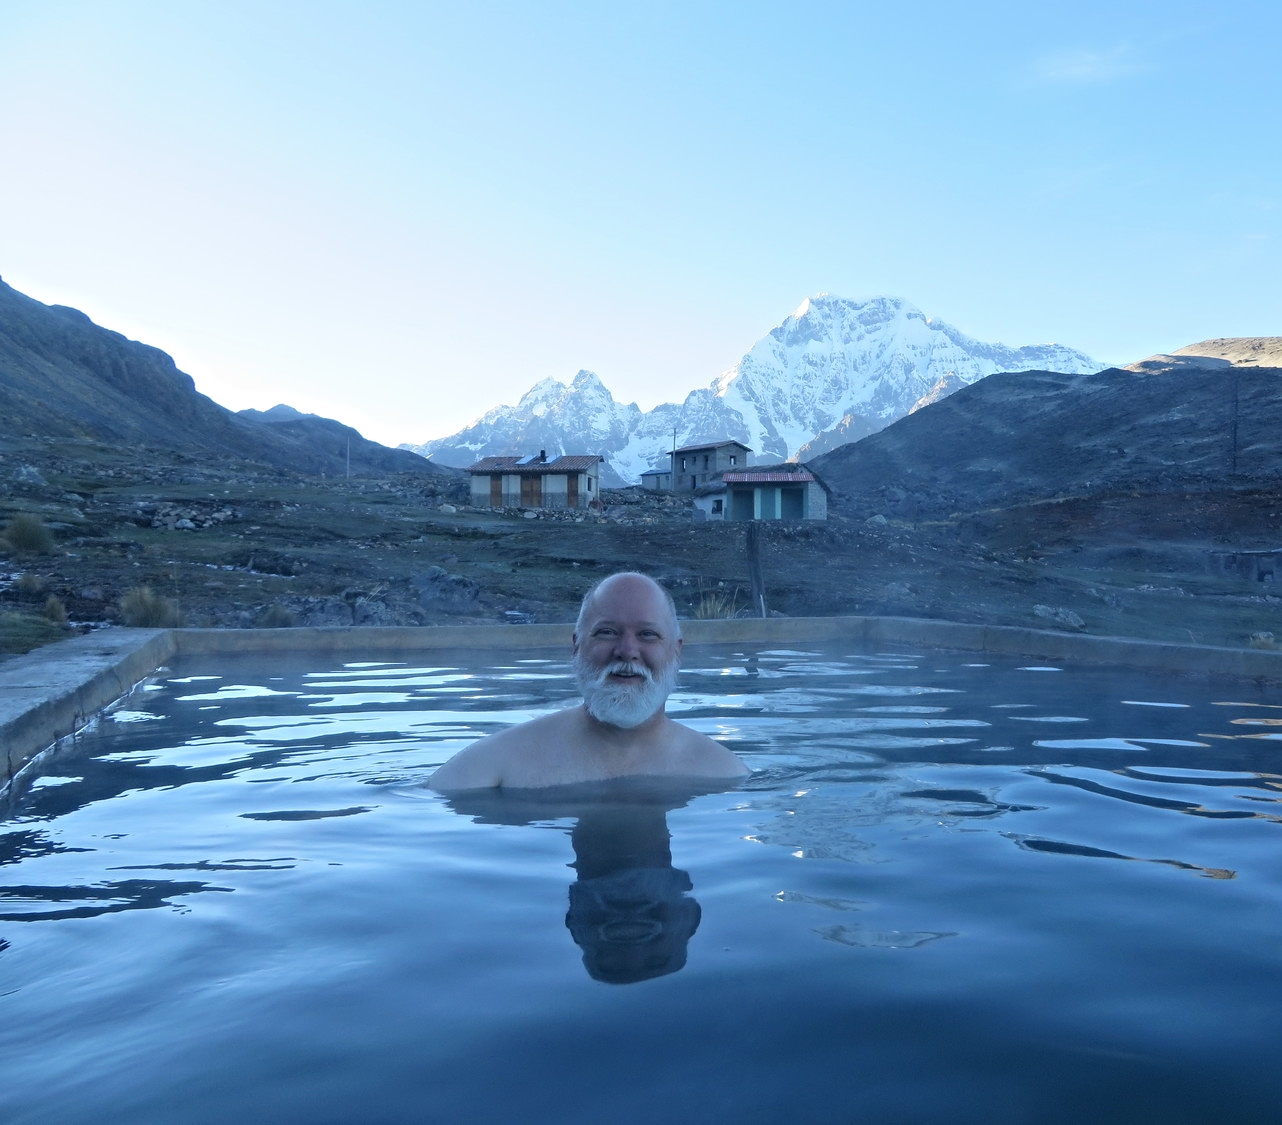 Jeffrey Rich, shamanic healing practitioner in hot springs, early morning at Apu Ausangate, Peru, 2013